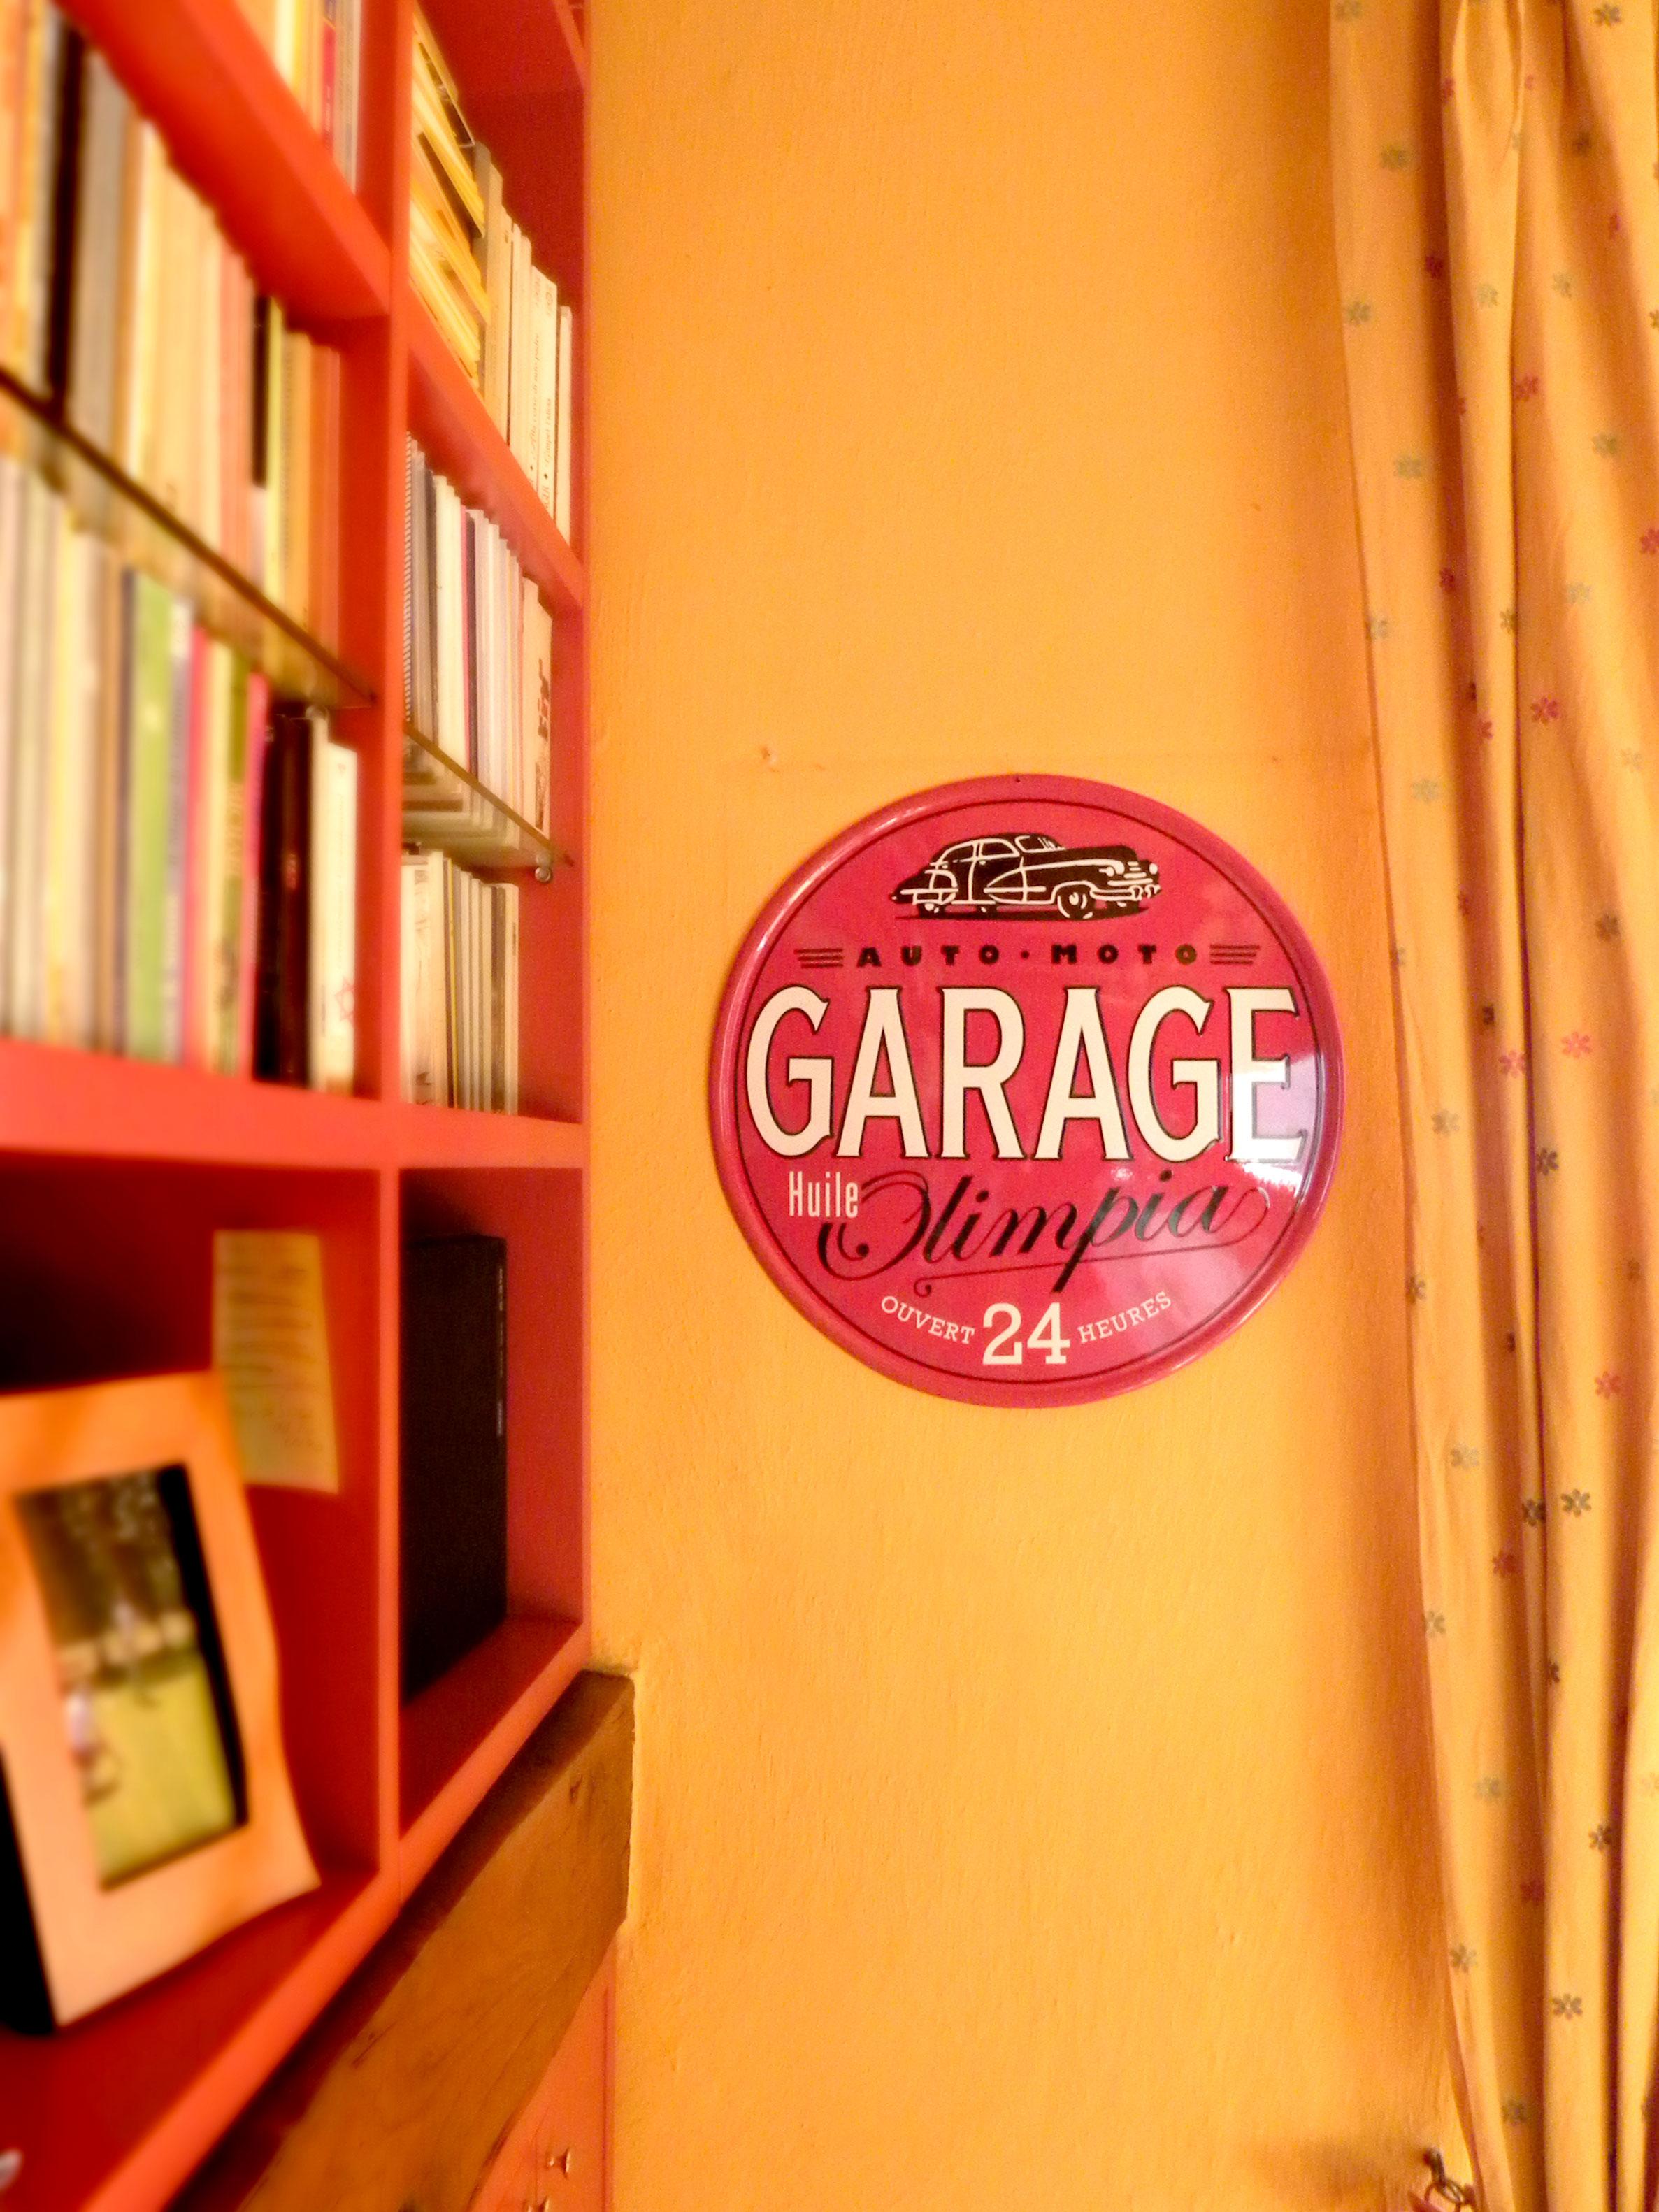 Garage Auto Moto